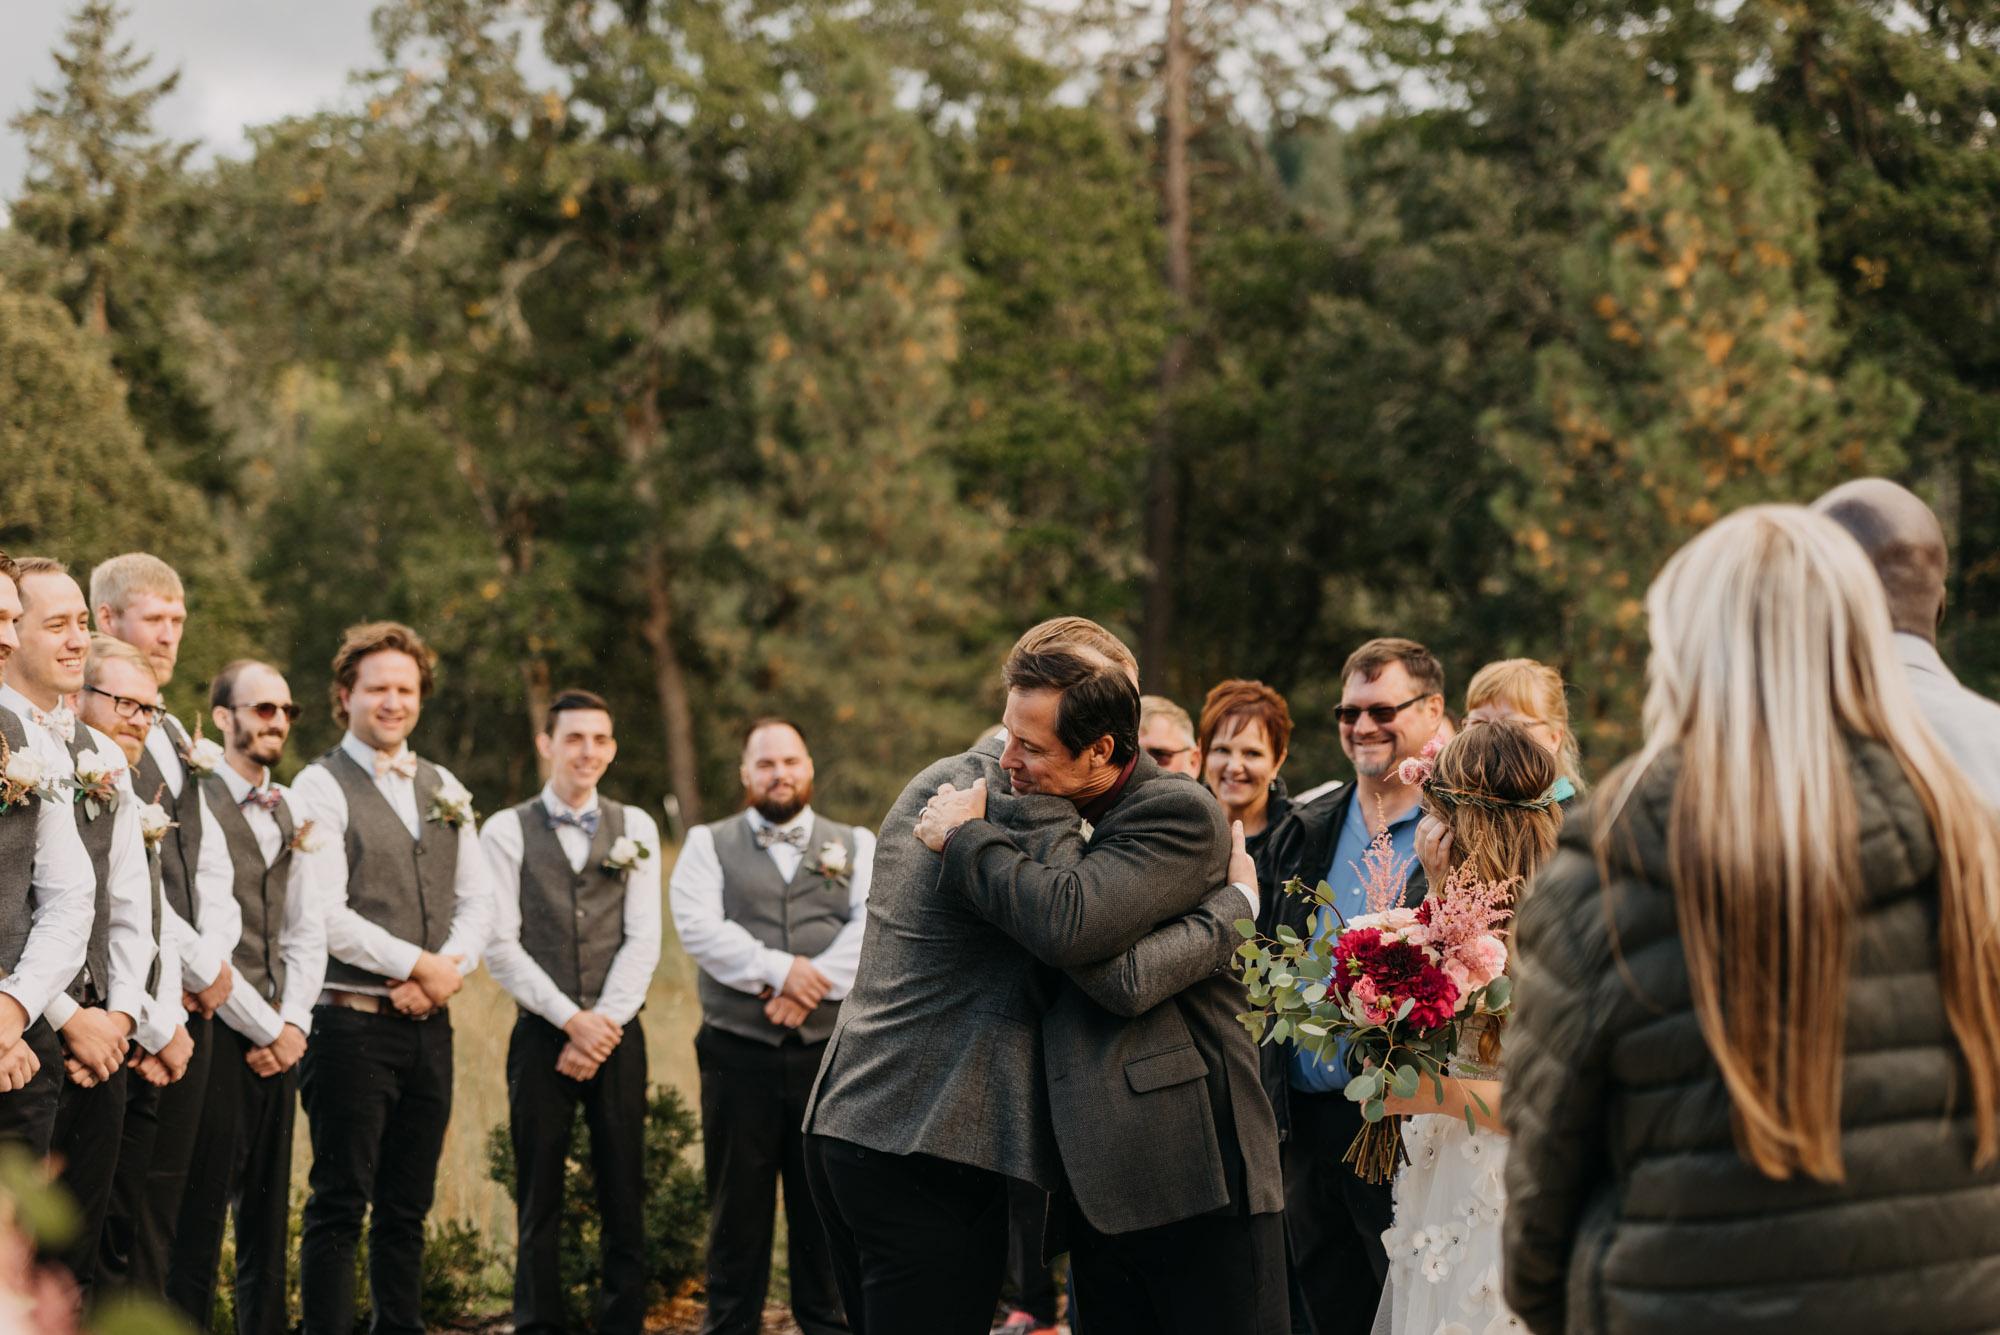 Outdoor-Summer-Ceremony-Washington-Wedding-Rainbow-8941.jpg